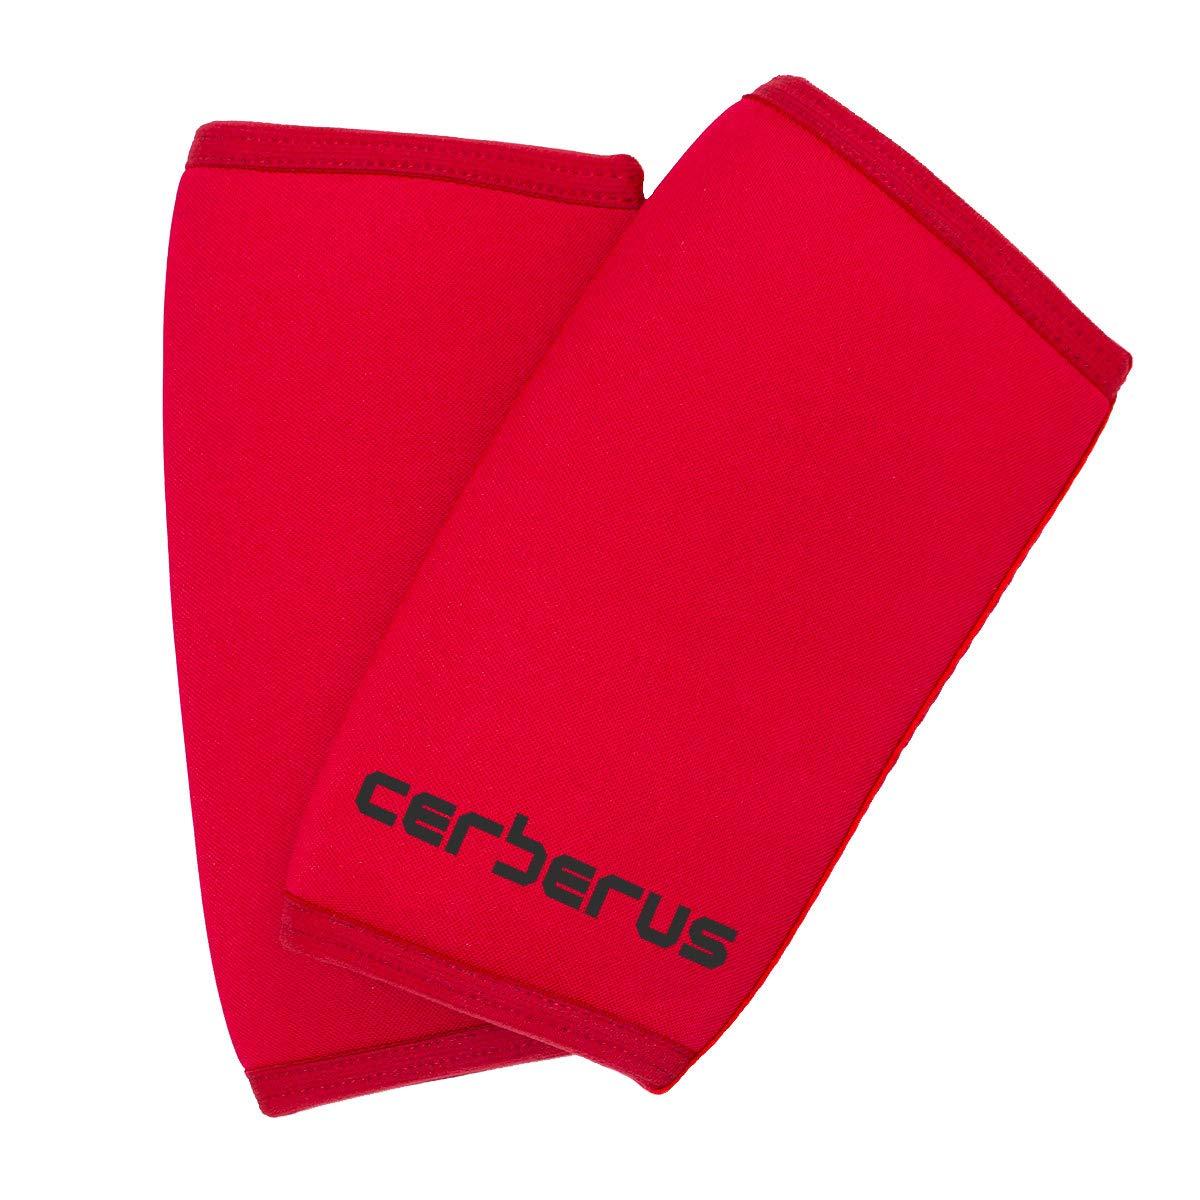 Cerberus強度7 mm Extreme Elbow Sleeves XXX-Large  B07FFKJMY6